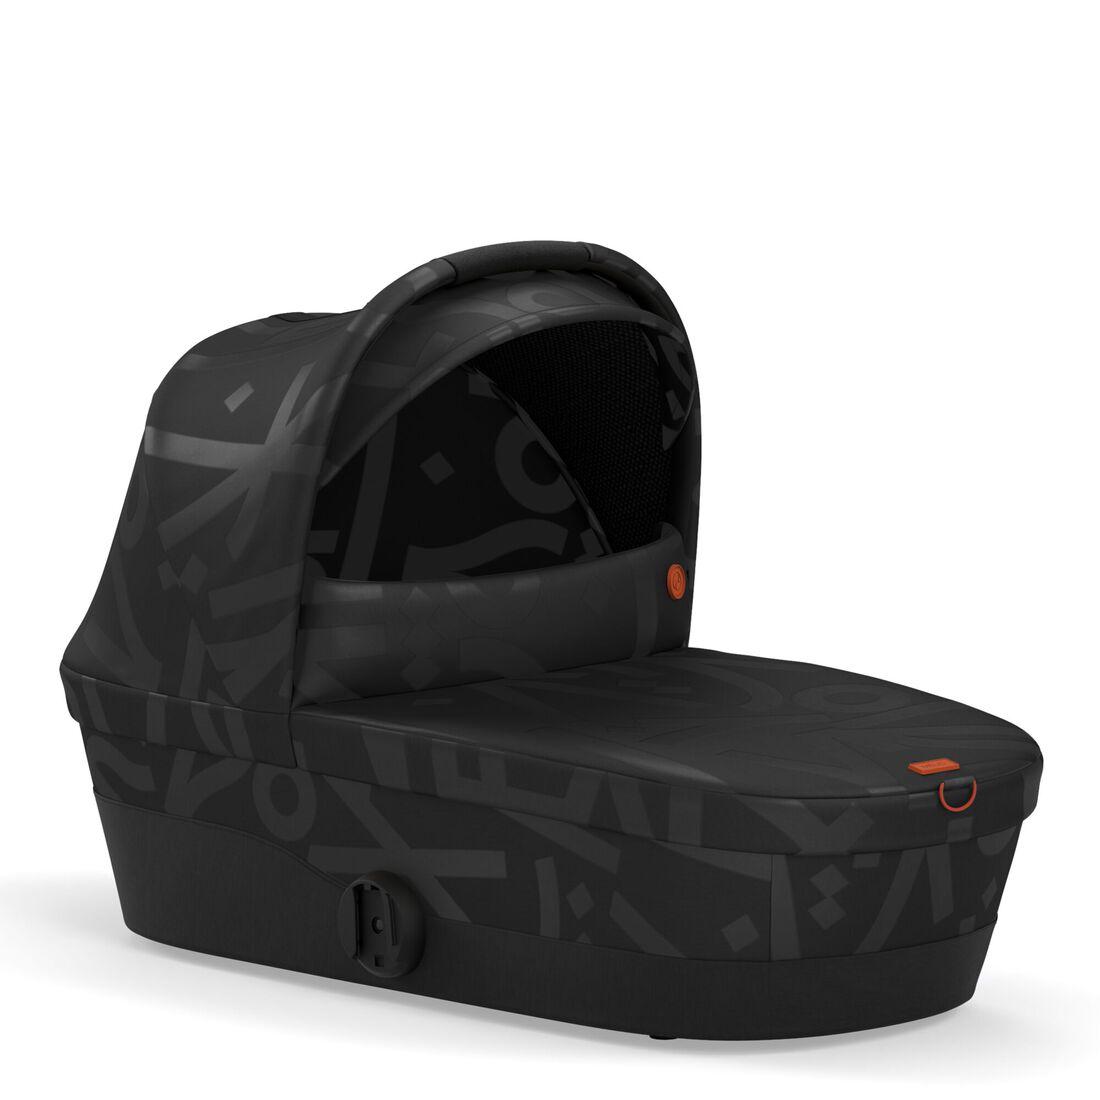 CYBEX Melio Cot - Real Black in Real Black large Bild 2